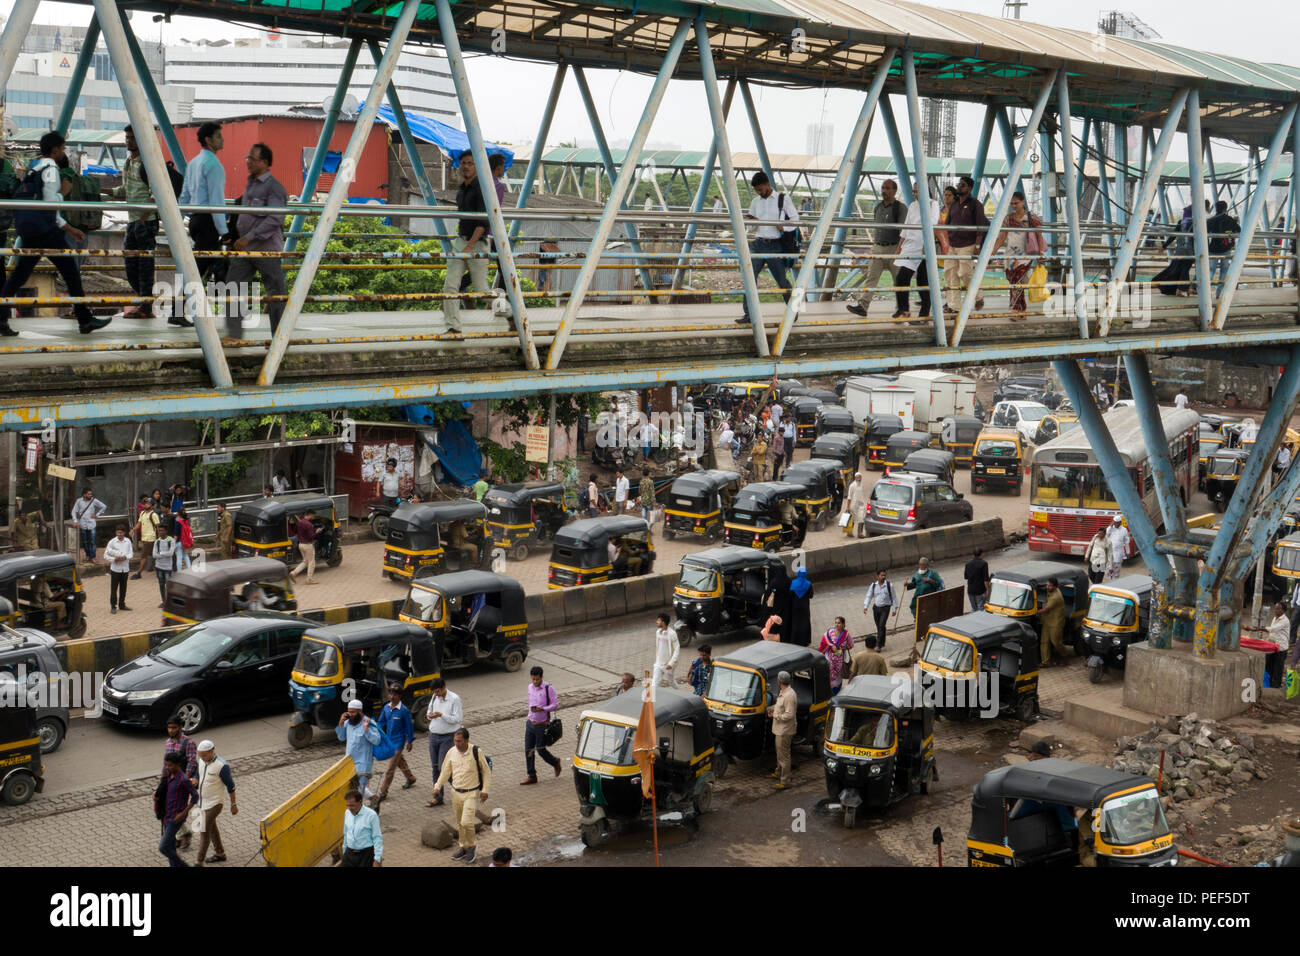 Auto rickshaw tuk tuks waiting for passengers at Bandra train station with skywalk pedestrian walkway above at Station road, Mumbai, India - Stock Image